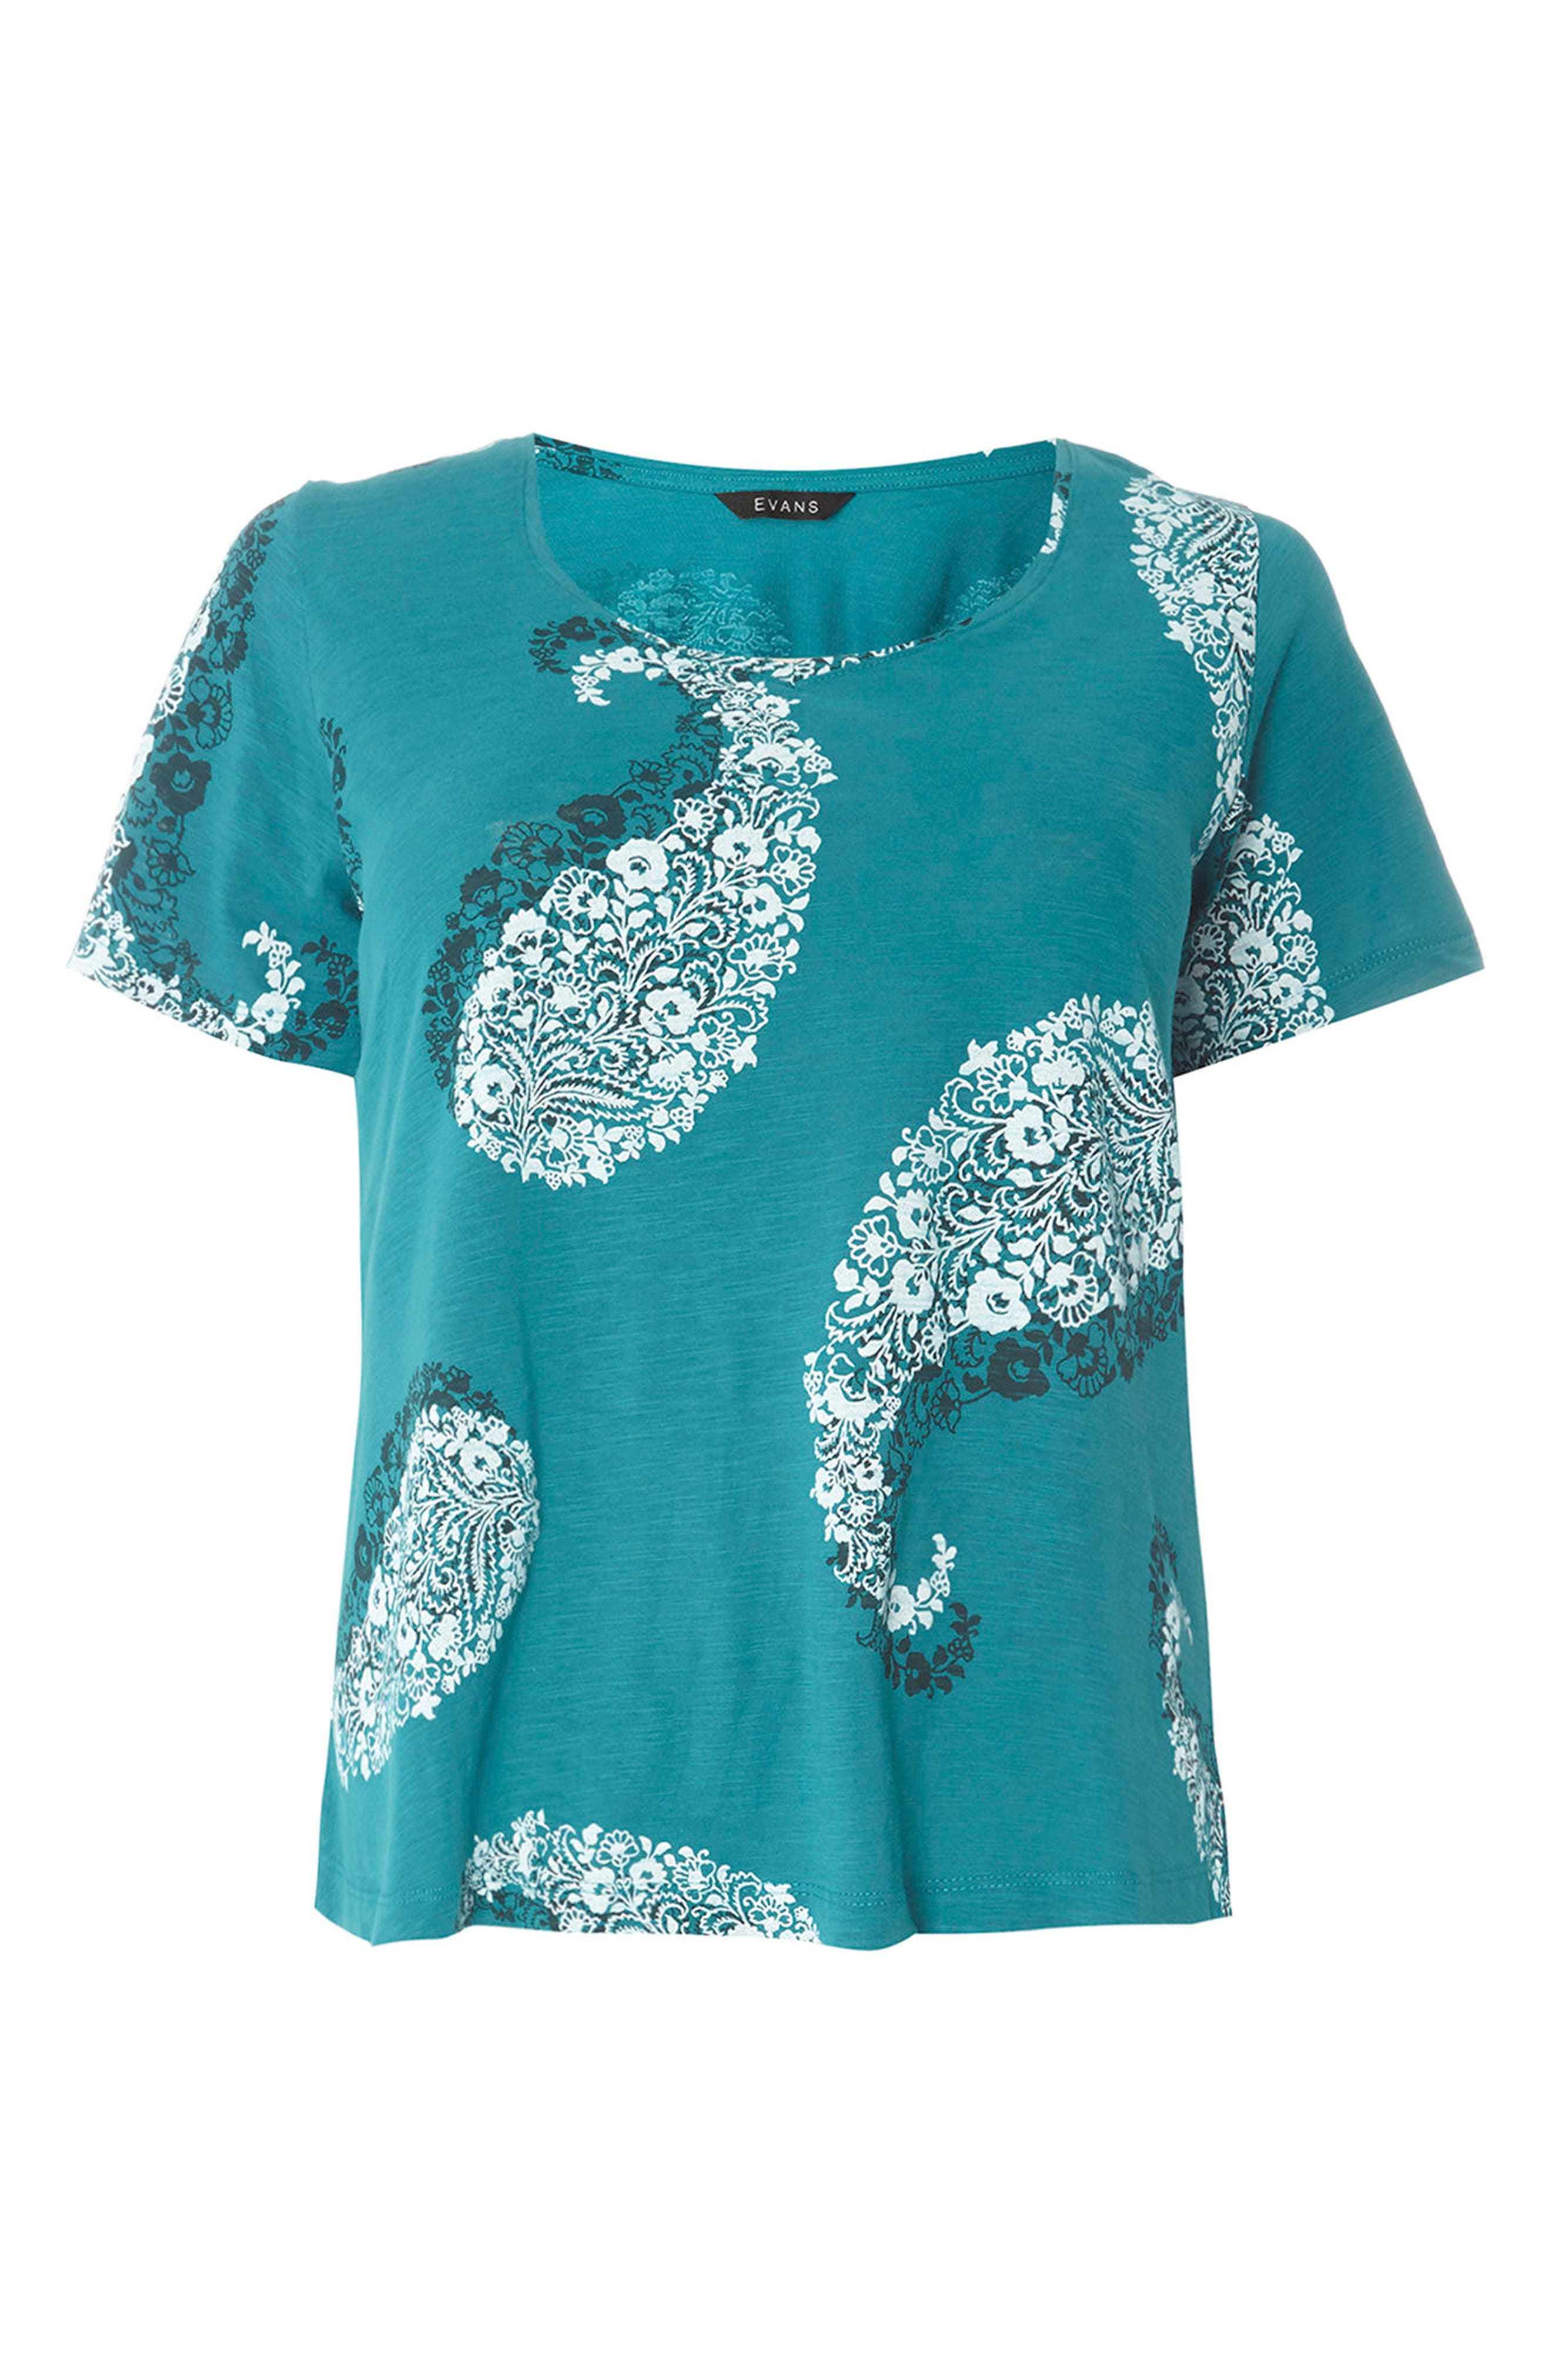 Evan Paisley Short Sleeve Shirt,                             Alternate thumbnail 4, color,                             401